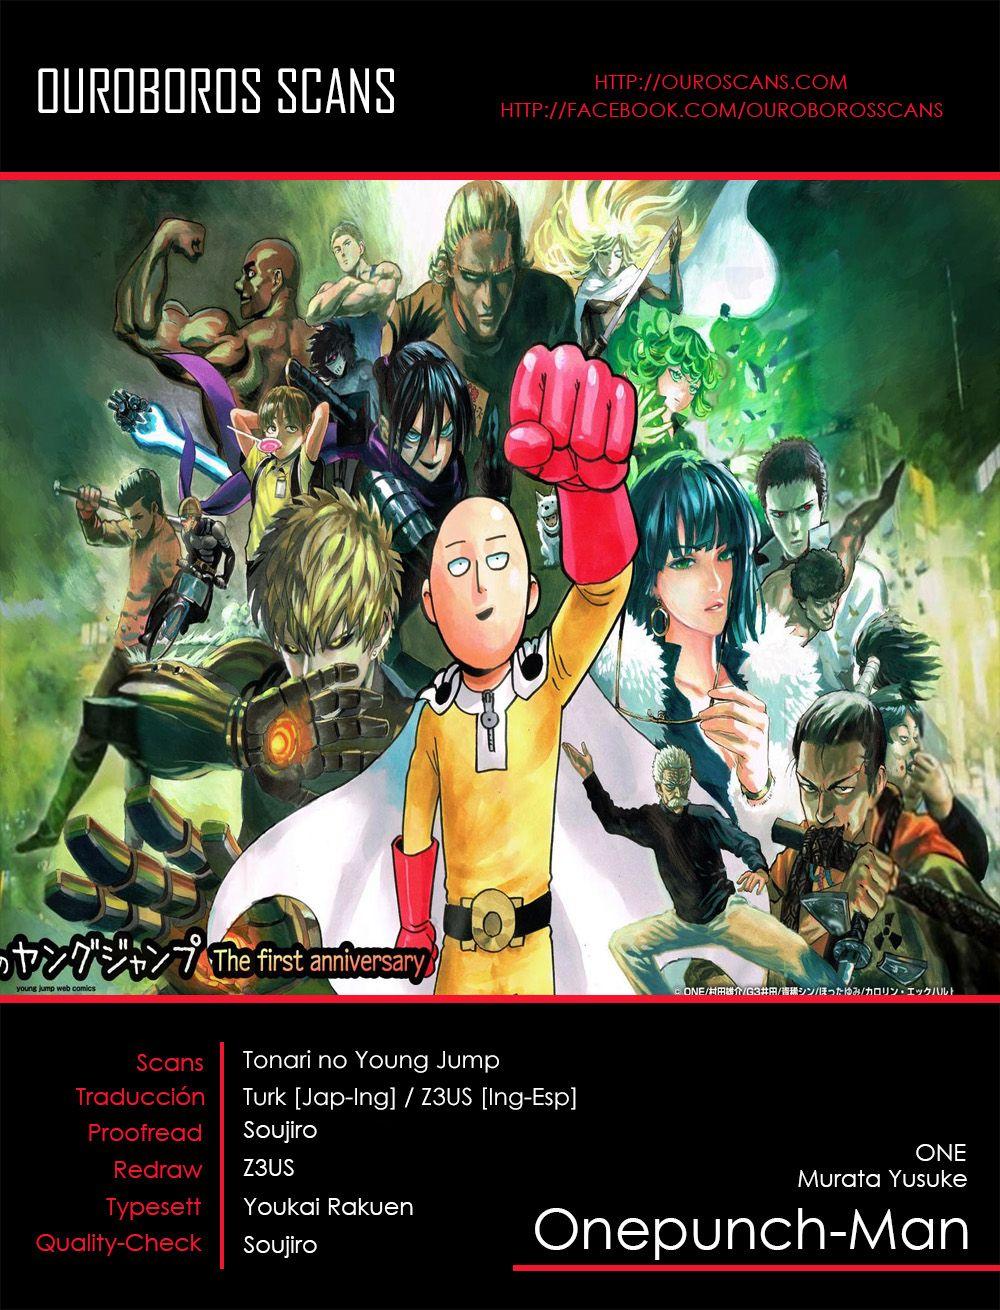 https://c5.ninemanga.com/es_manga/21/14805/468291/d1ee896289d2e2ed272e9b45a2860492.jpg Page 1